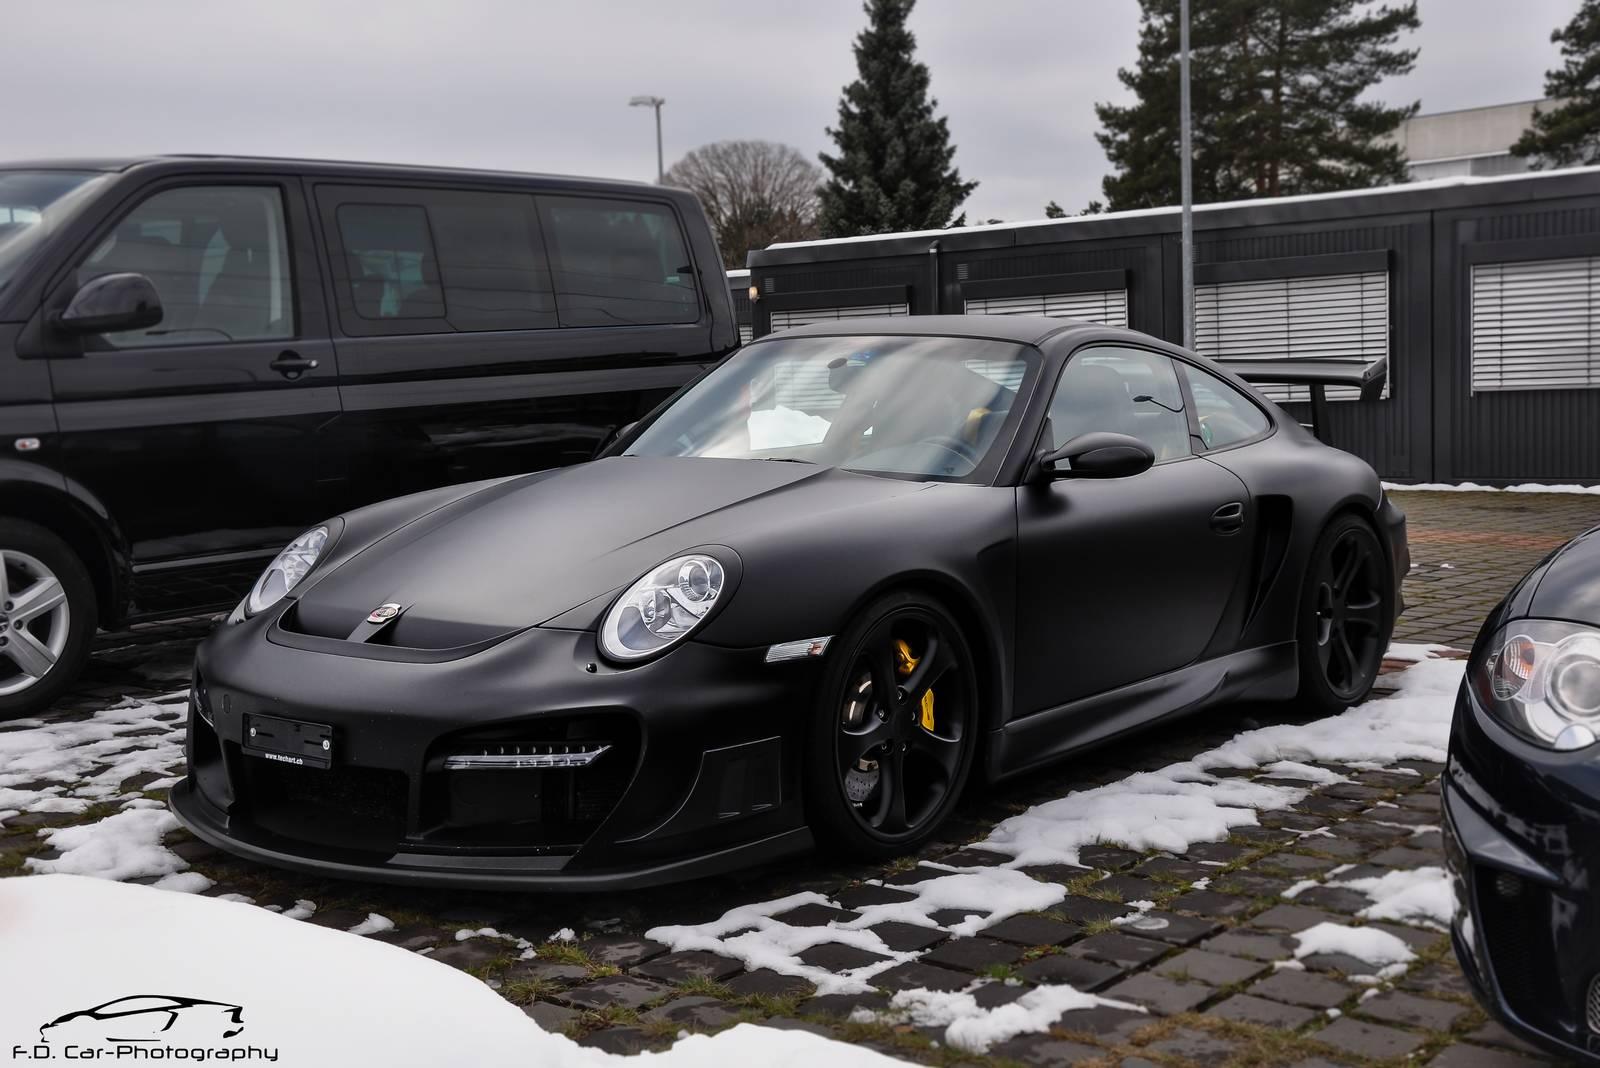 porsche 911 techart gtstreetr foto 5 di 6 - Porsche 911 2014 Black